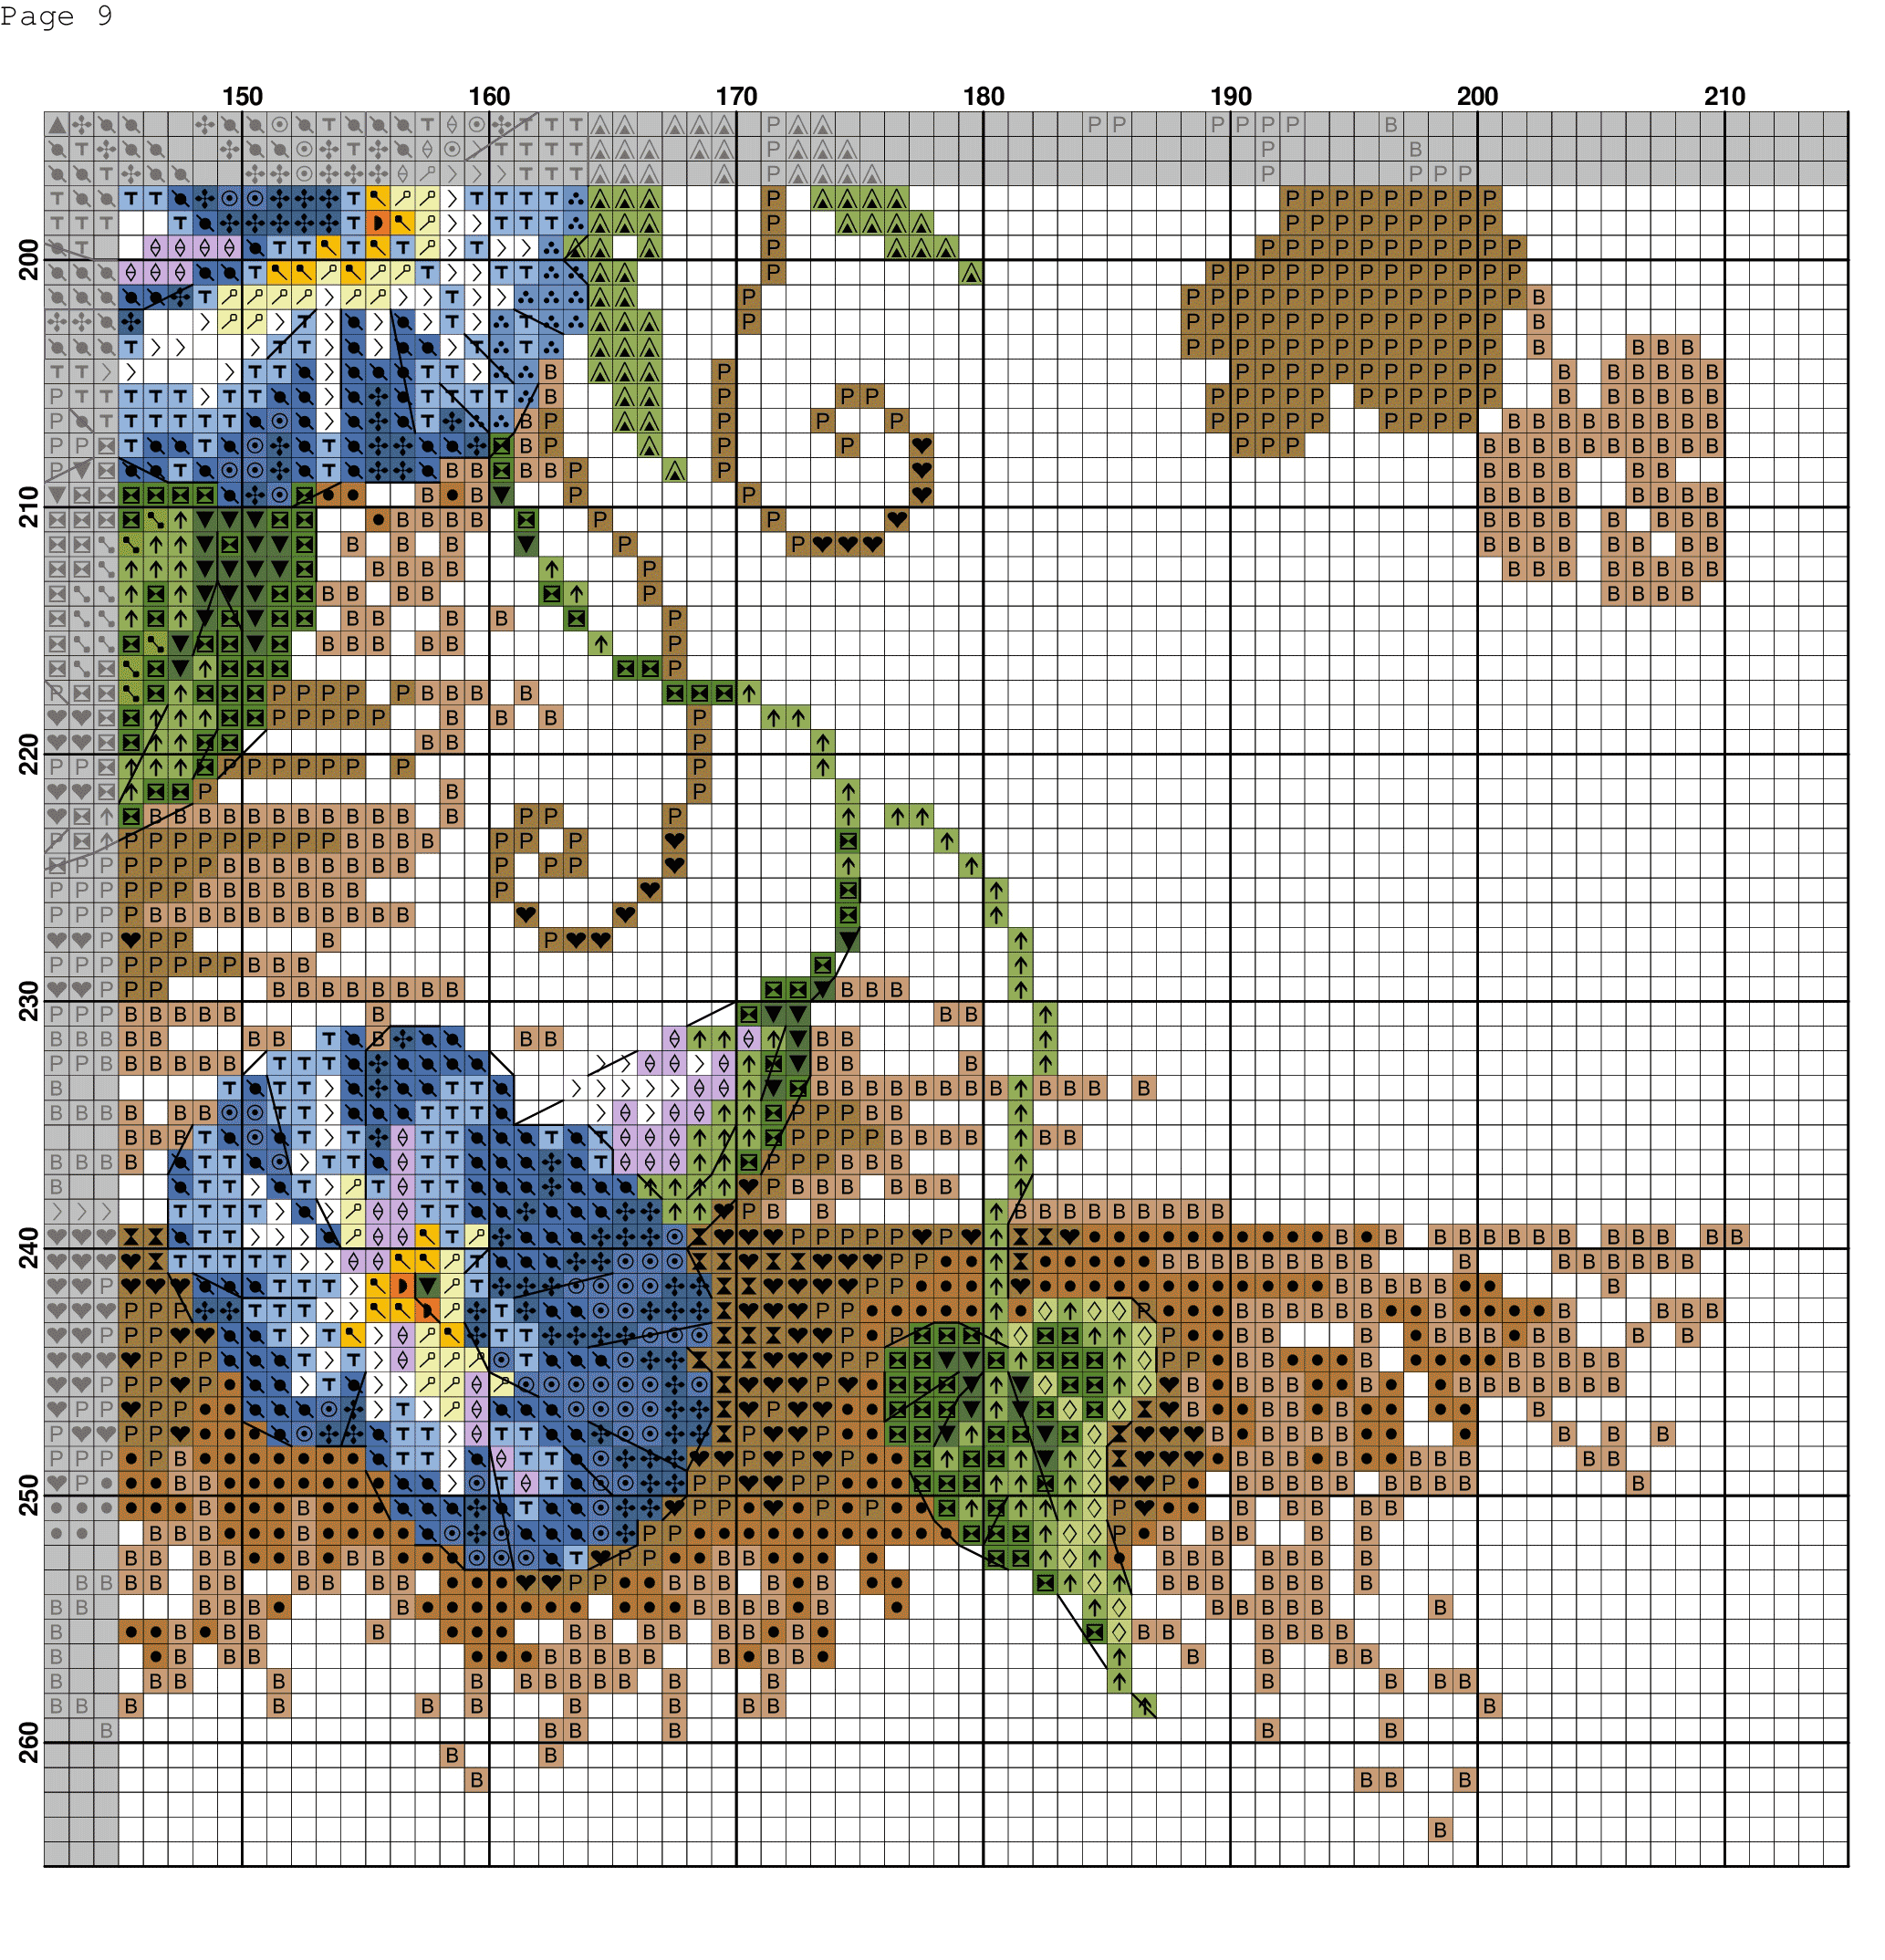 wildflowers-cross-stitch-patterns-(10)